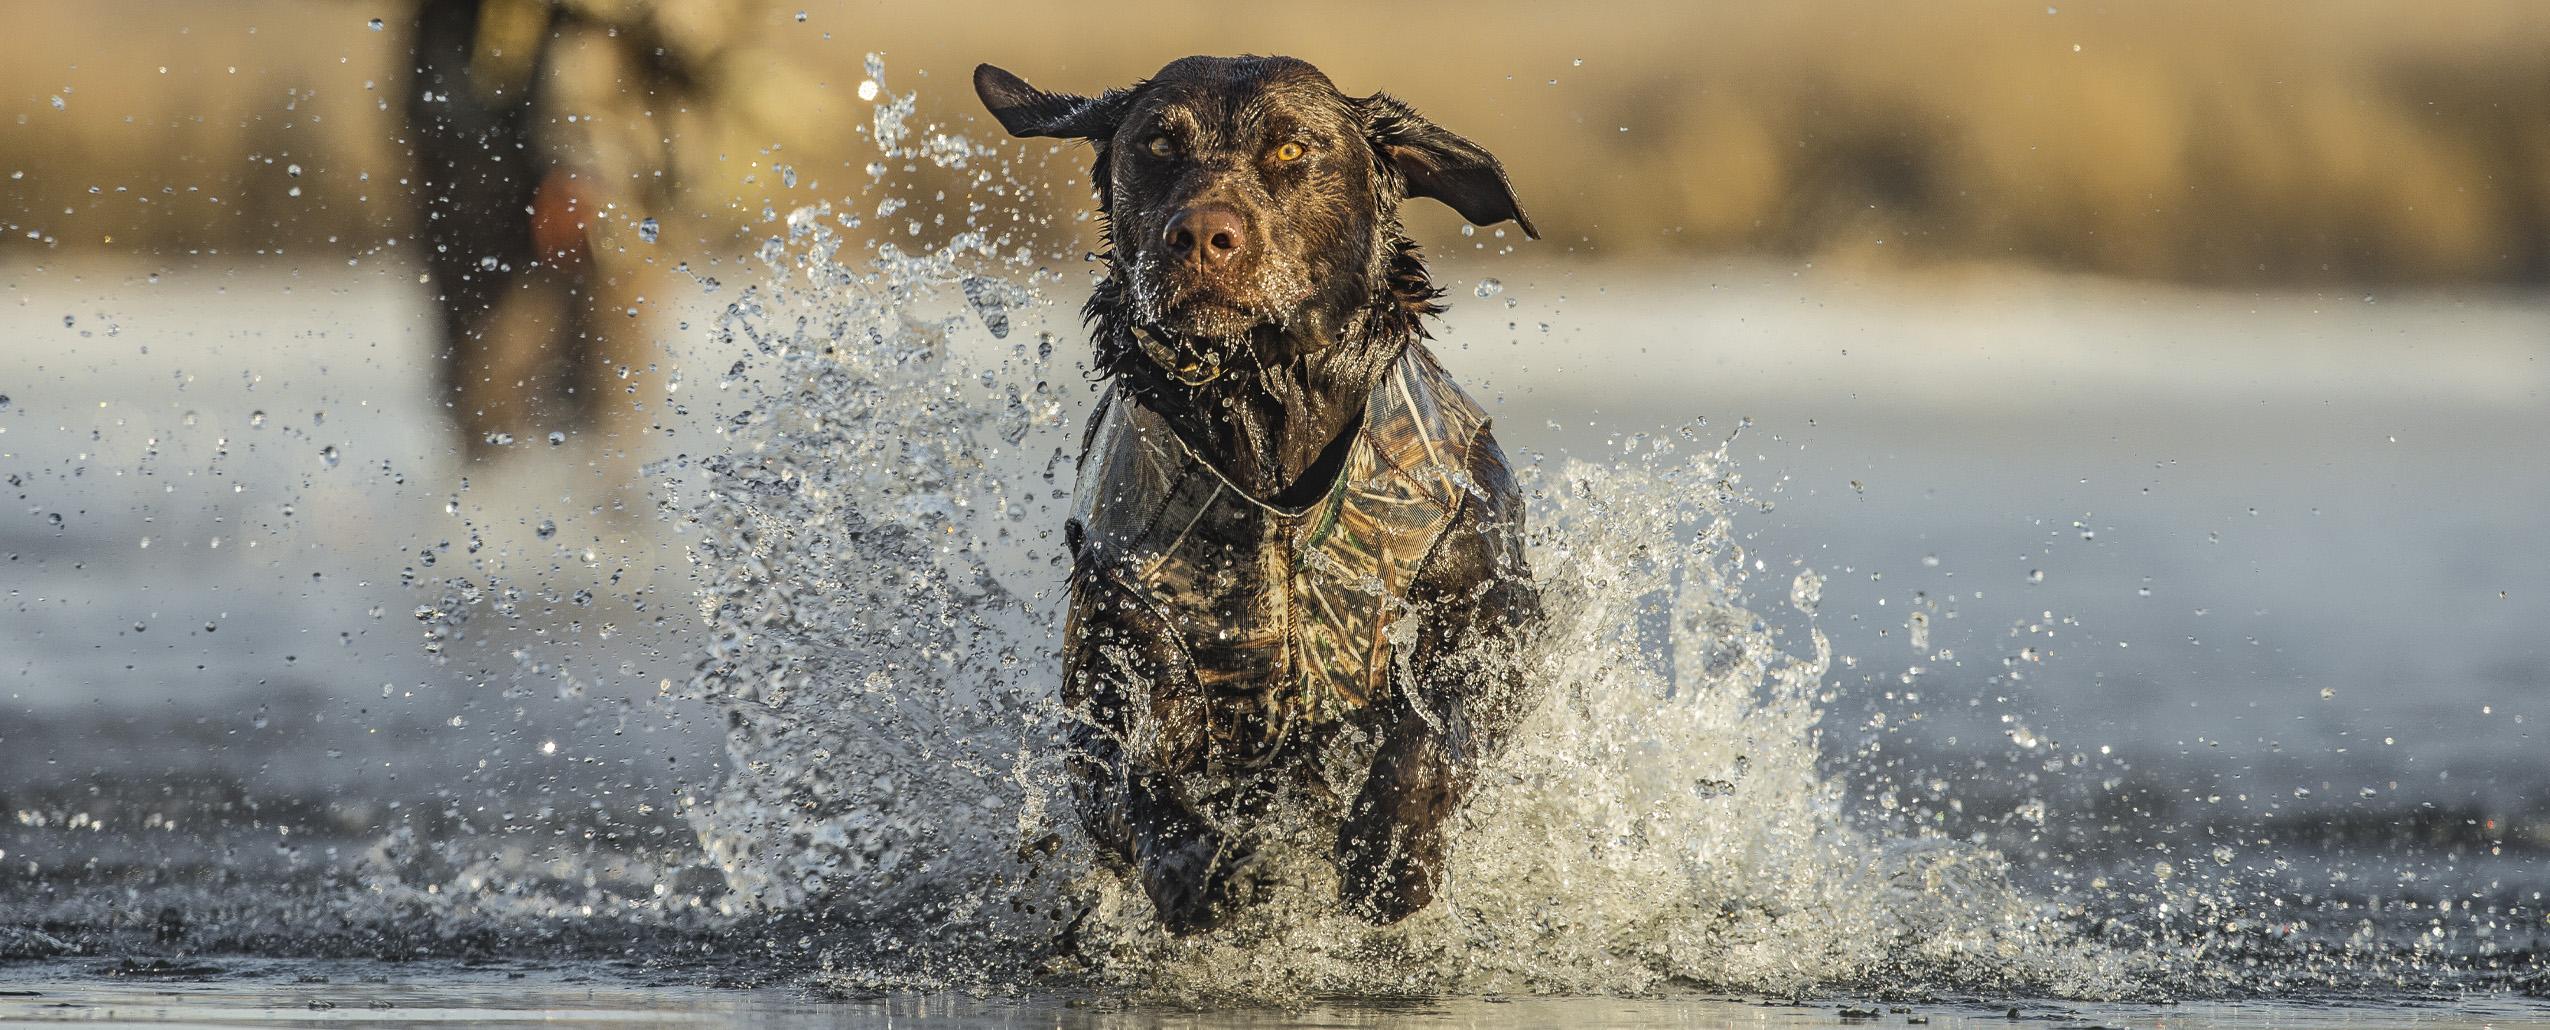 Camo Duck Dog